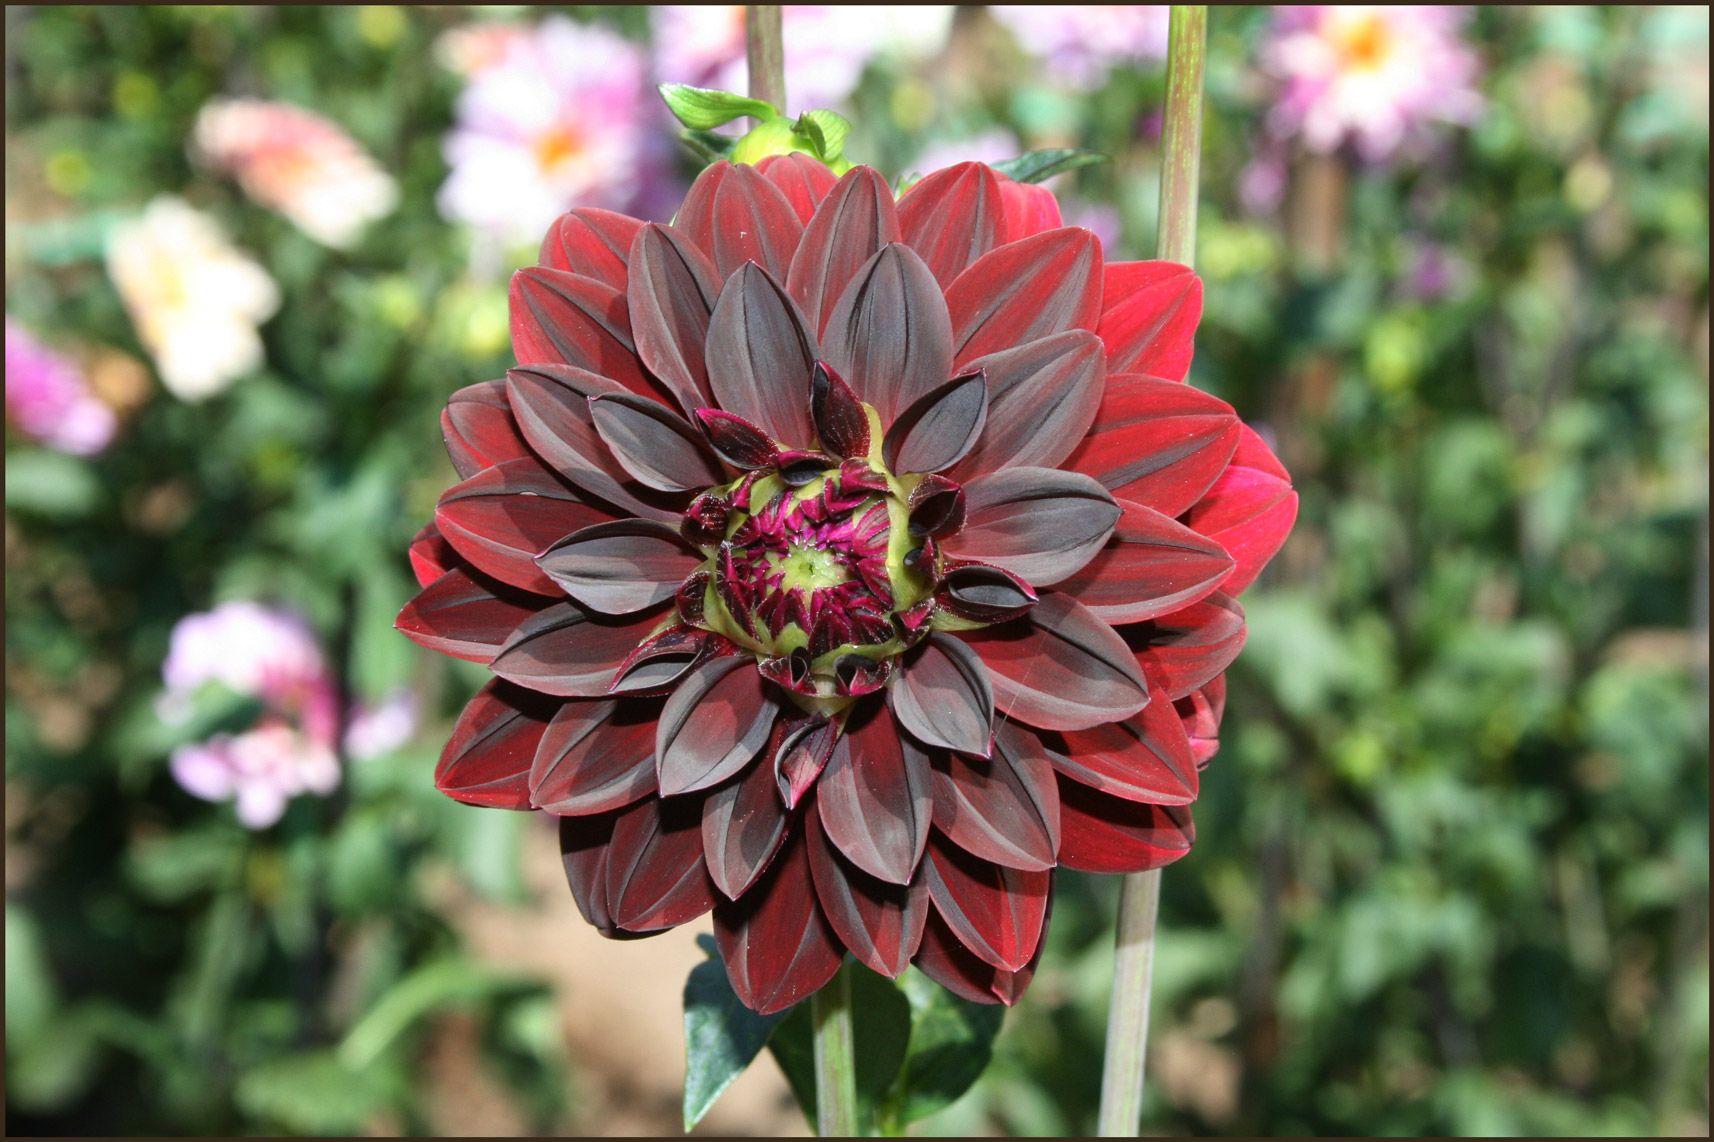 Dahlia Dahlias In Bloom At Filoli Steves Genealogy Blog Bm